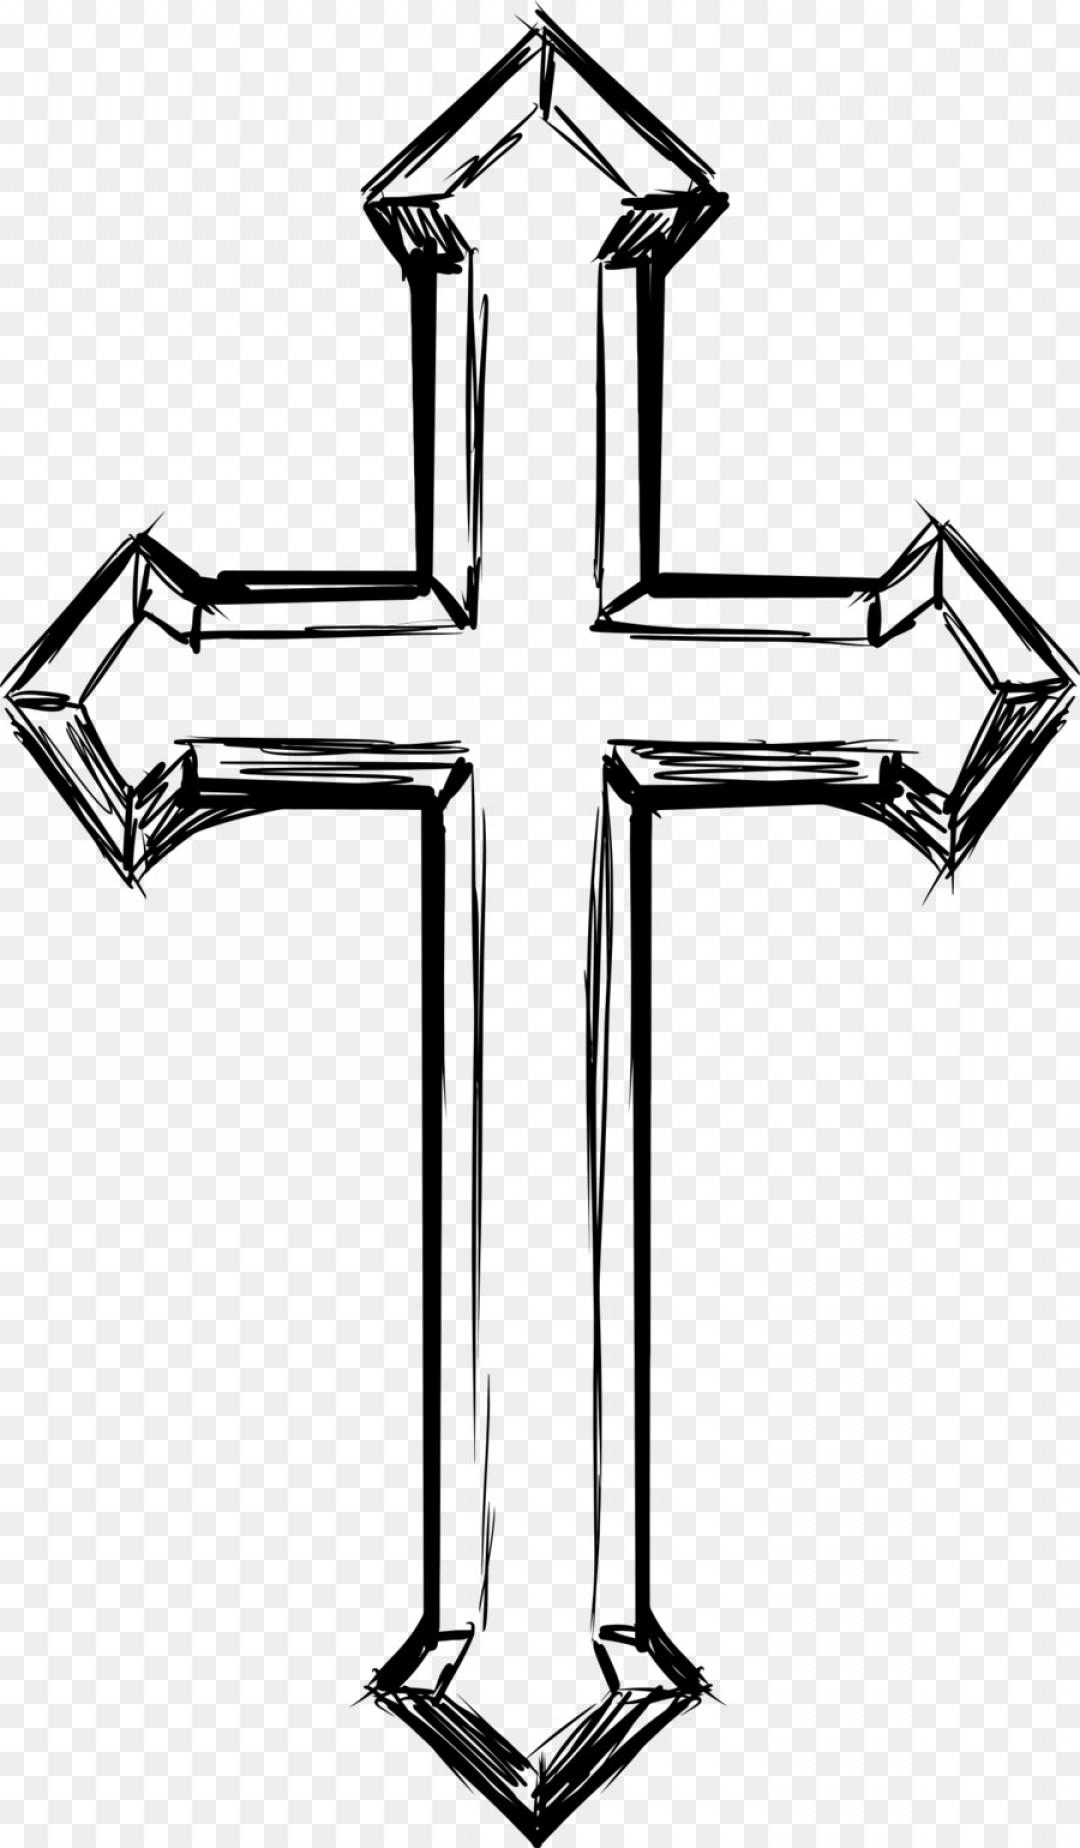 1080x1848 Png Christian Cross Drawing Clip Art Creative Cross Sohadacouri